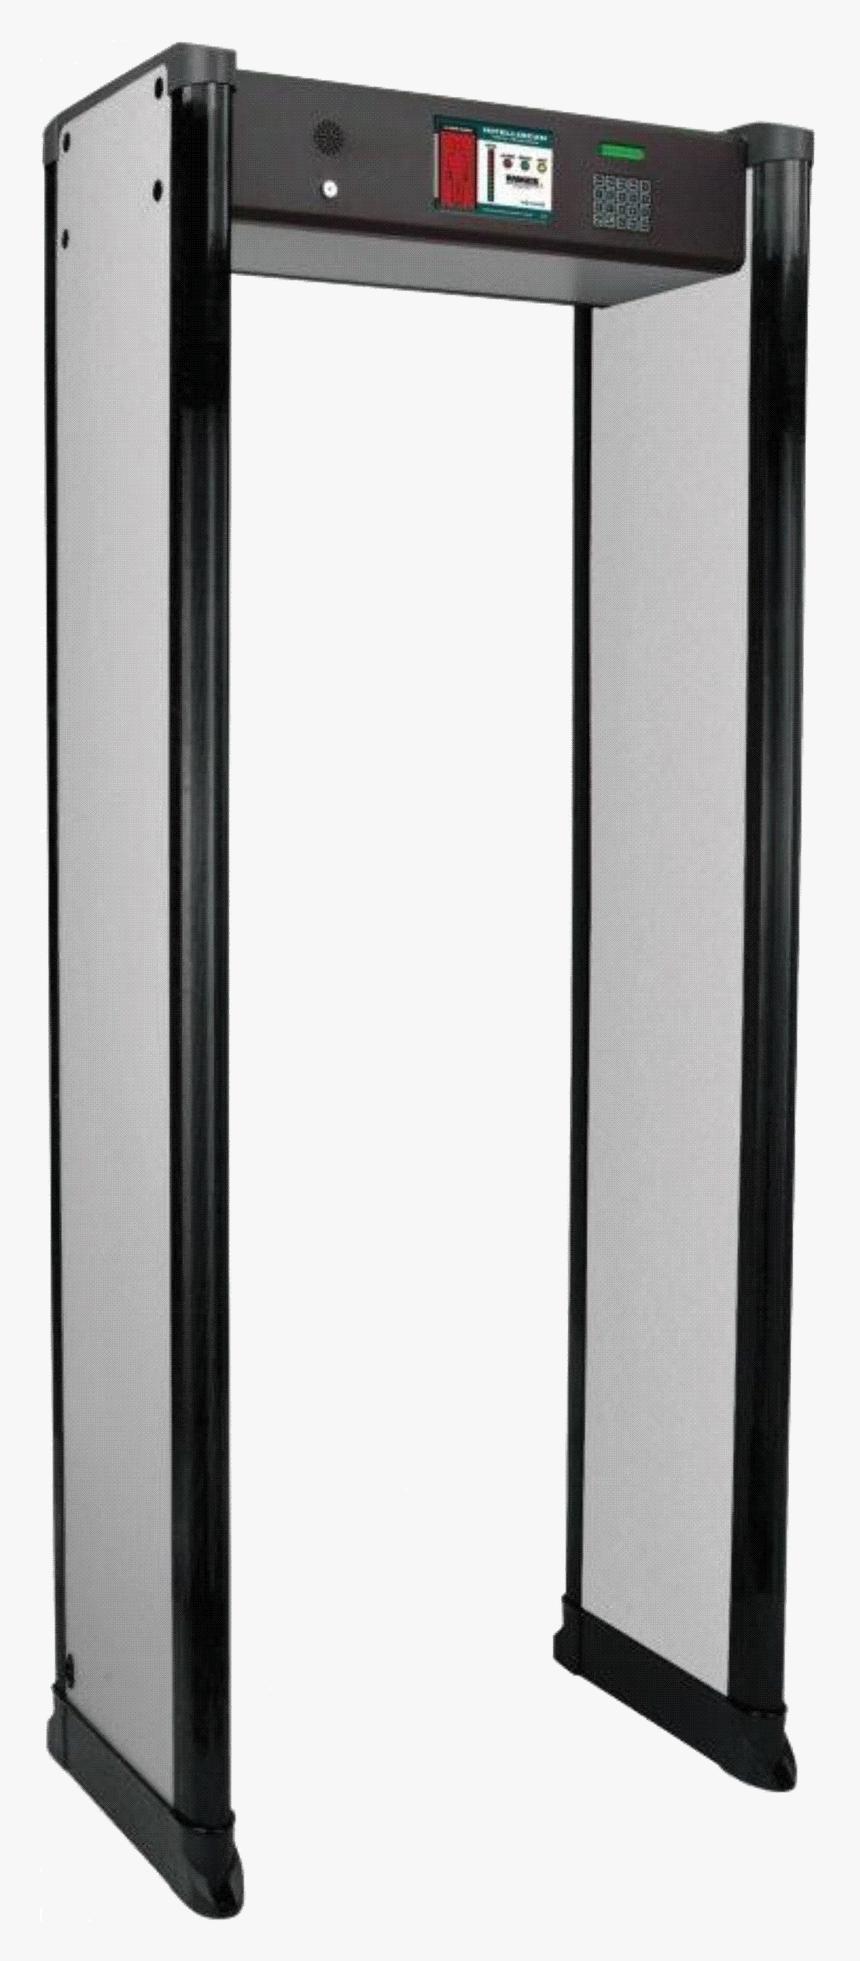 Transparent Metal Detector Png - Ranger Walk Through Metal Detector, Png Download, Free Download